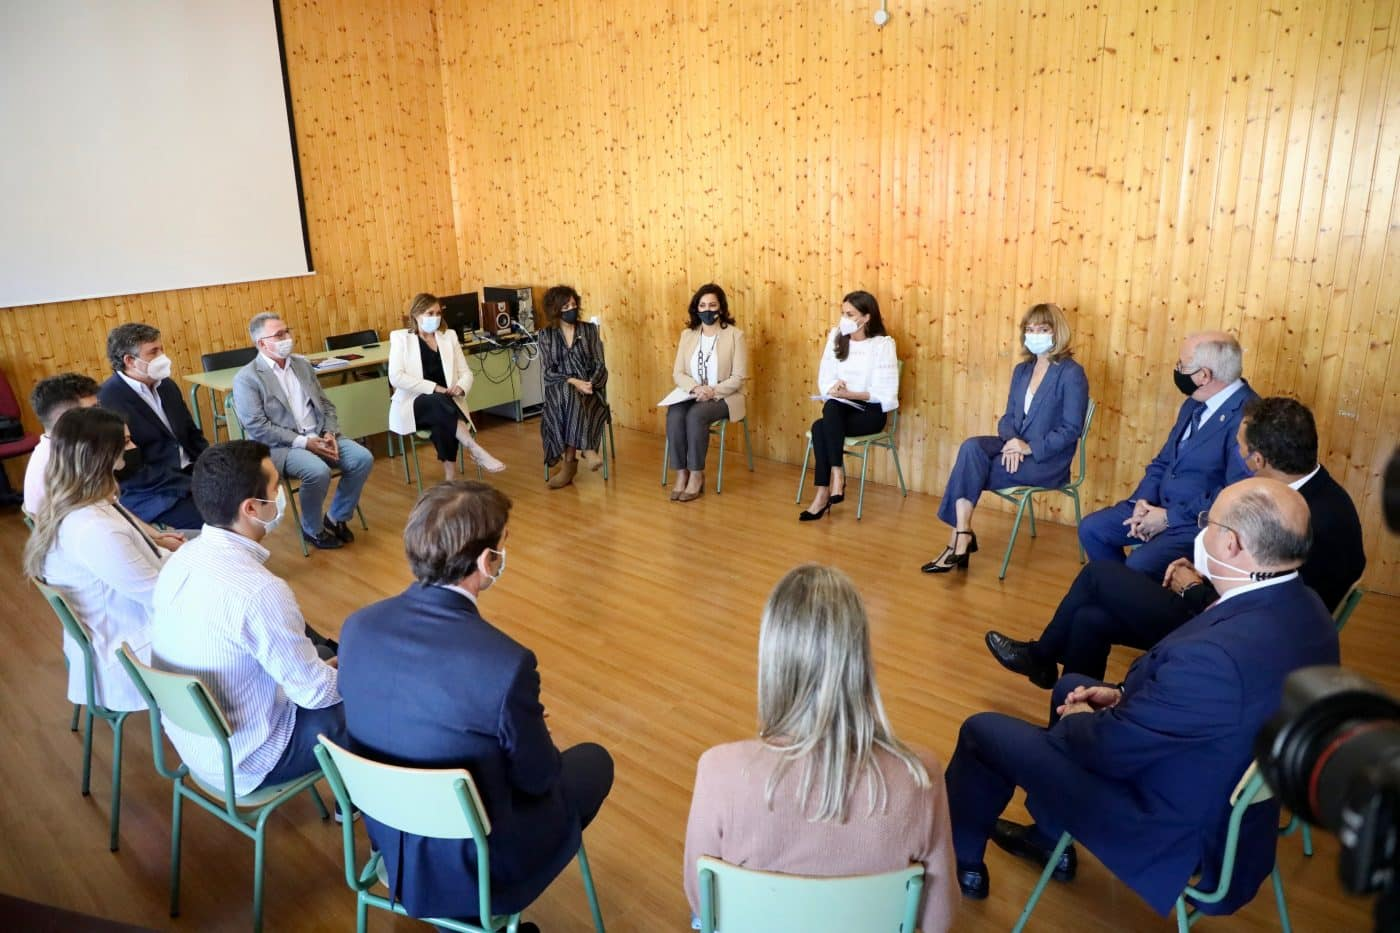 La reina Letizia preside en Haro la apertura del curso de FP 7